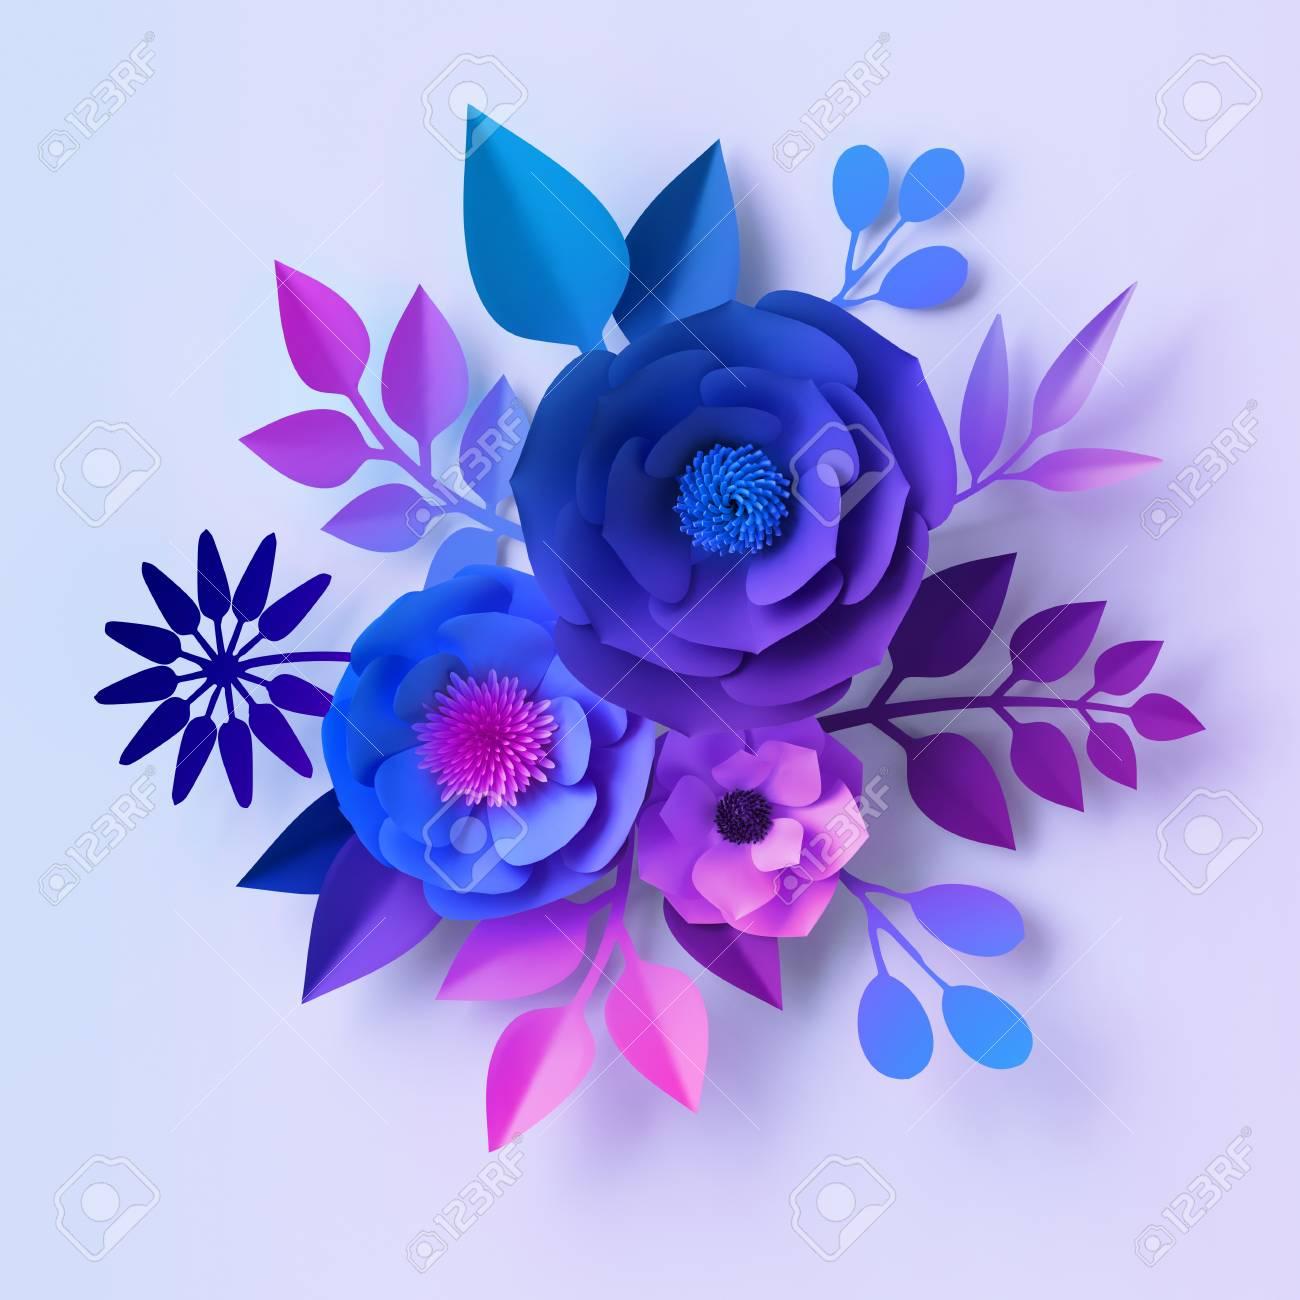 3d Render Blue Violet Neon Paper Flowers Floral Bouquet Isolated